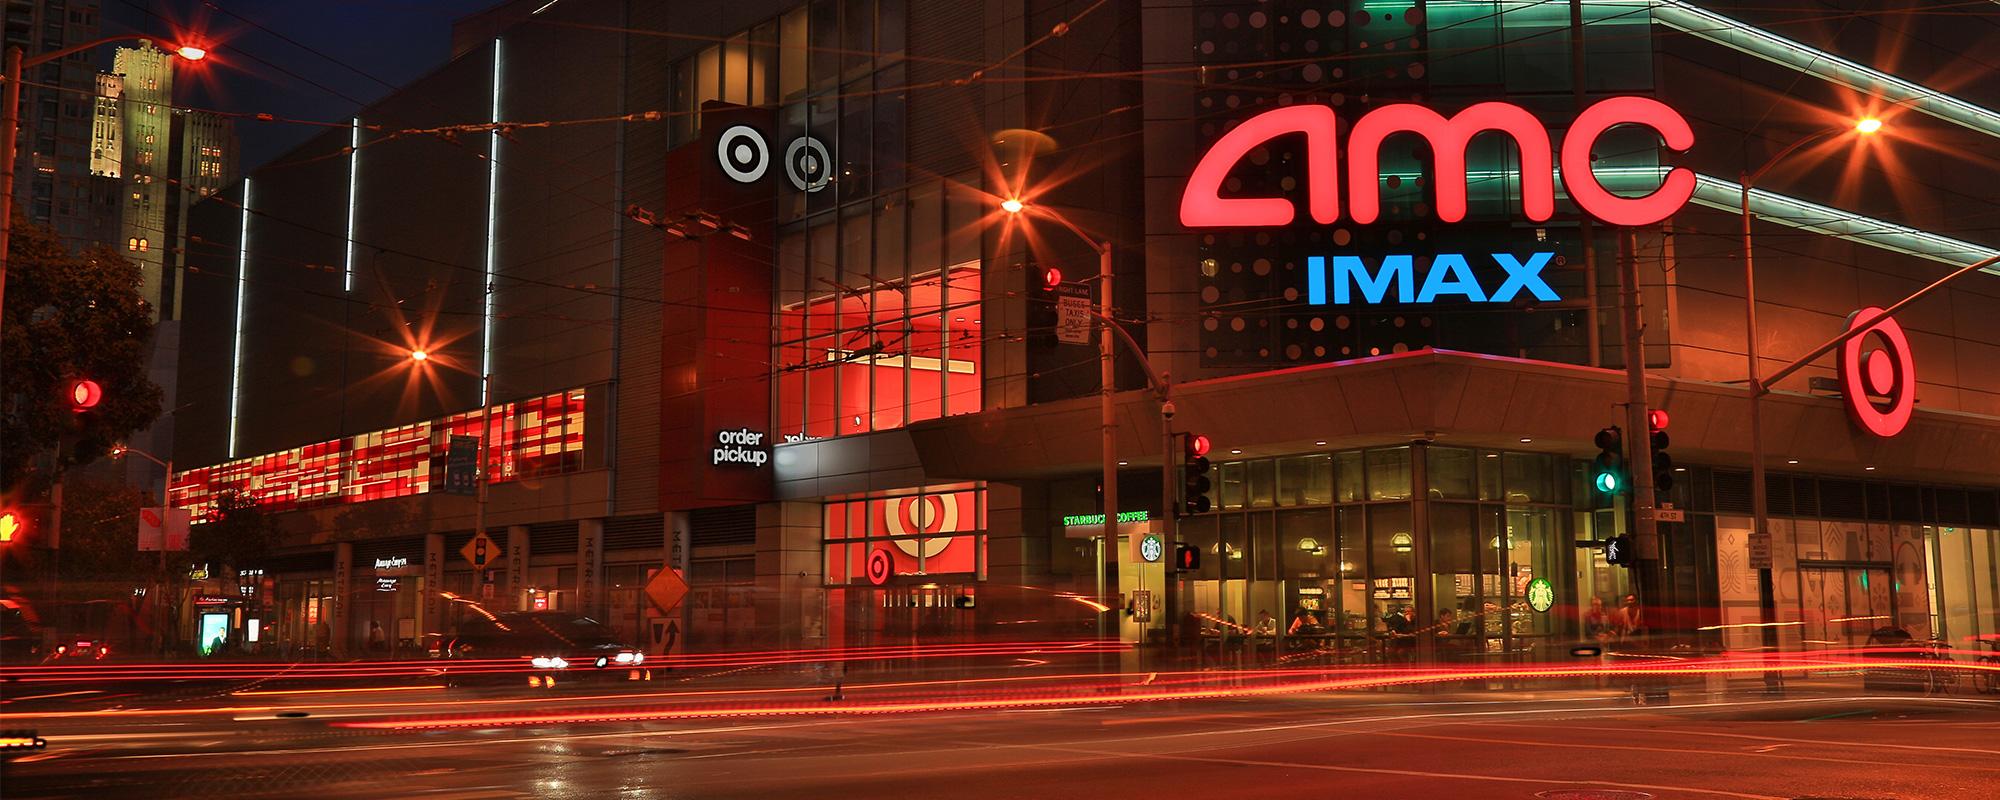 Amc Metreon 16 San Francisco California 94103 Amc Theatres